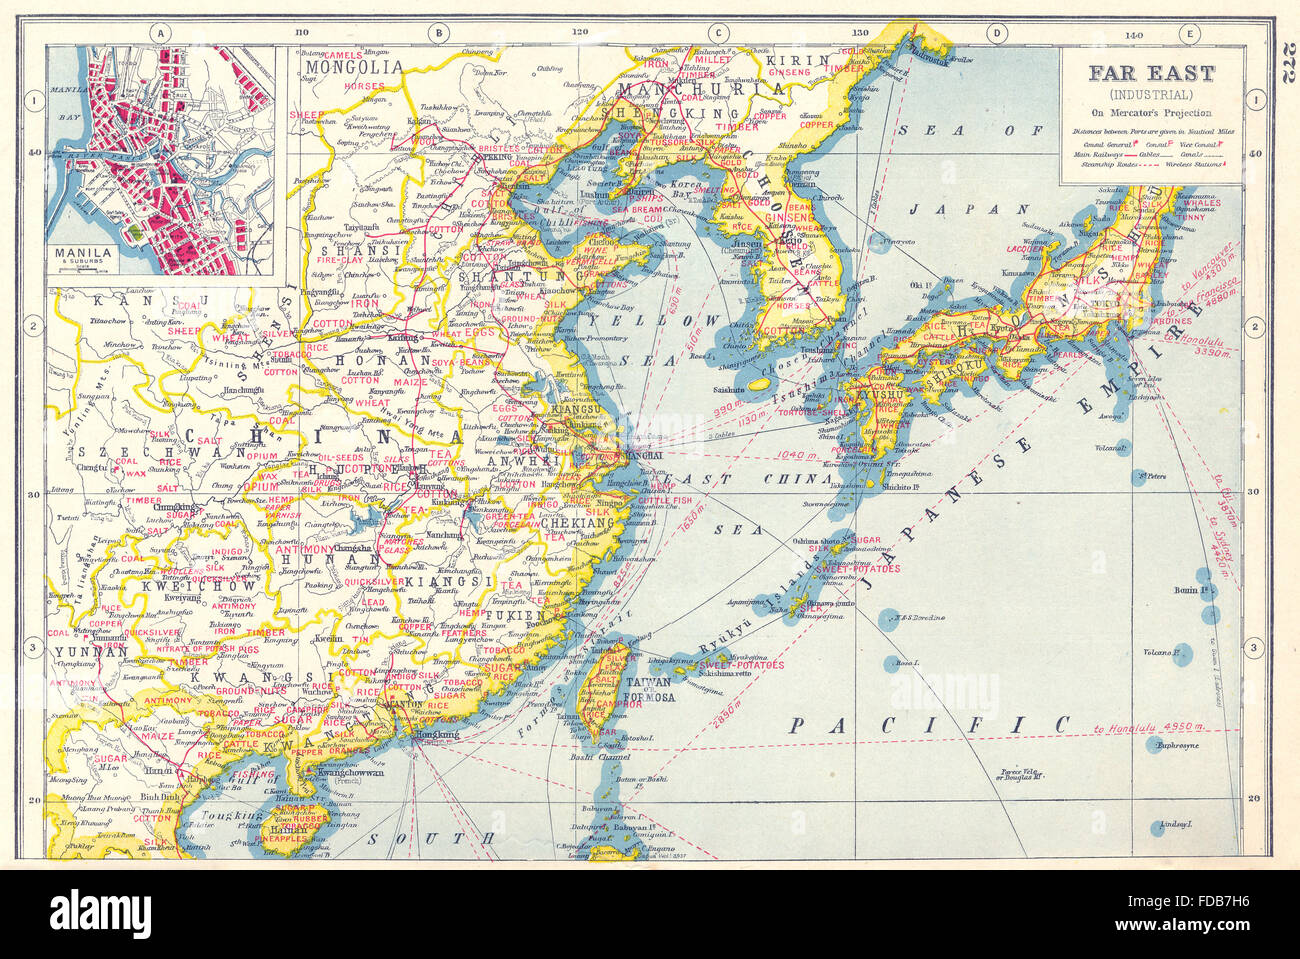 EAST ASIA AGRICULTURALMINERAL PRODUCTSChina Japan KoreaManila - Japan map 1920